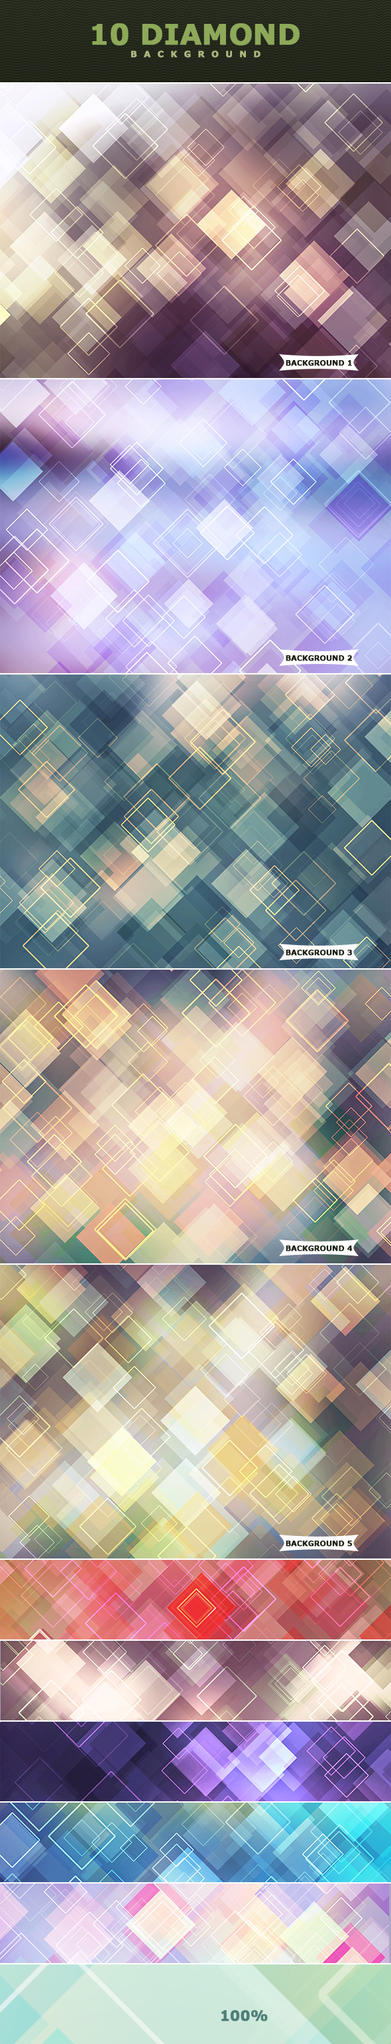 Diamond Backgrounds by ViktorGjokaj